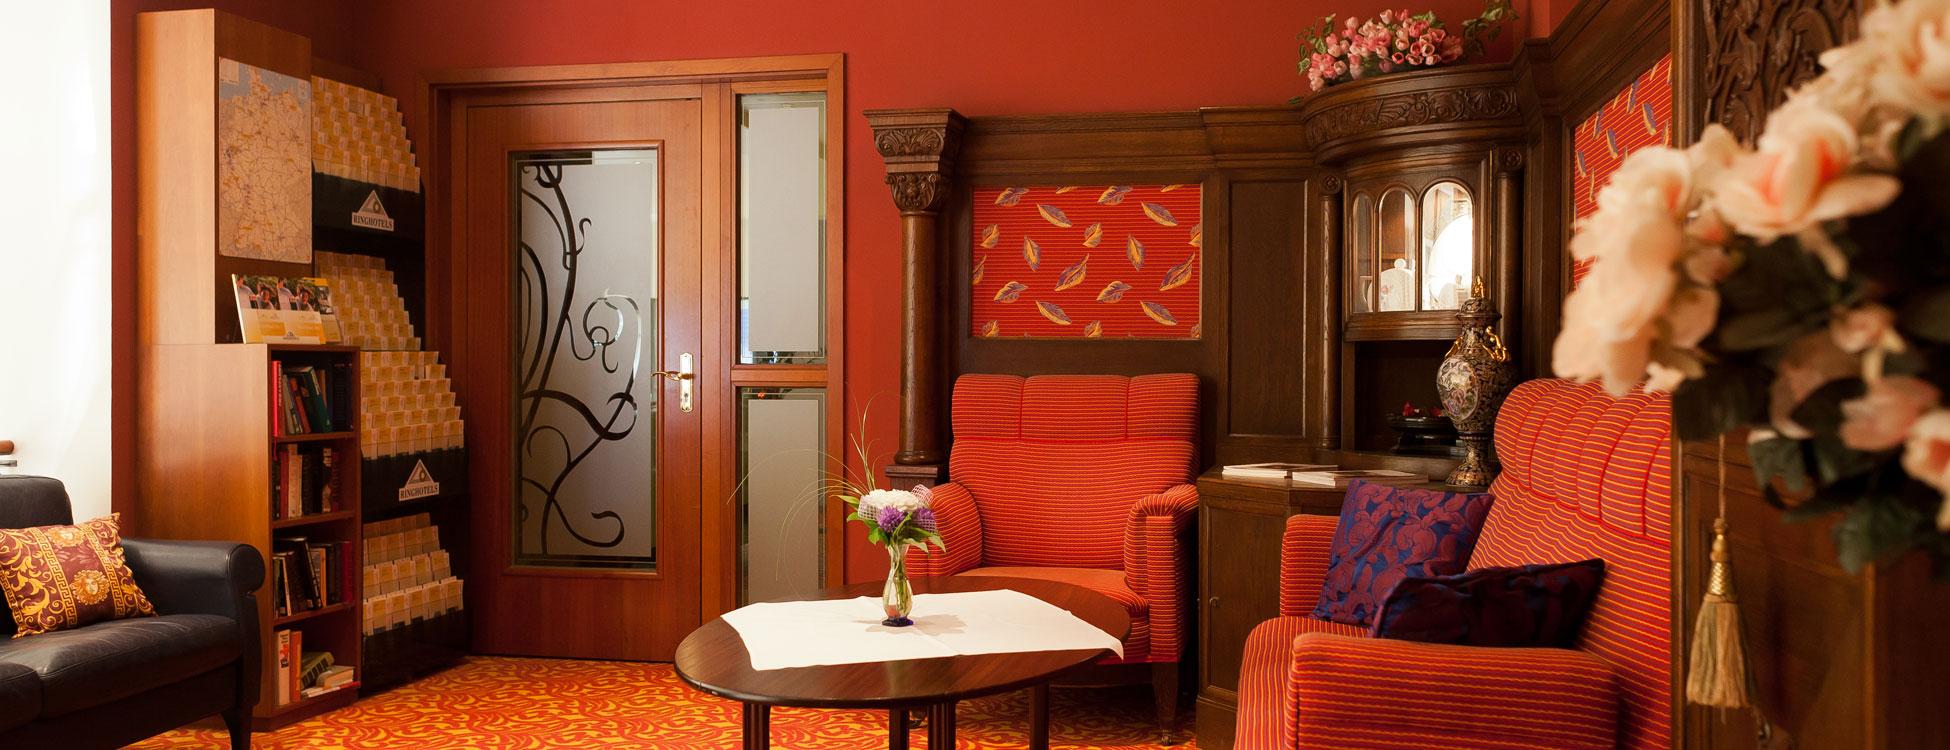 Foyer - Ringhotel Strandblick